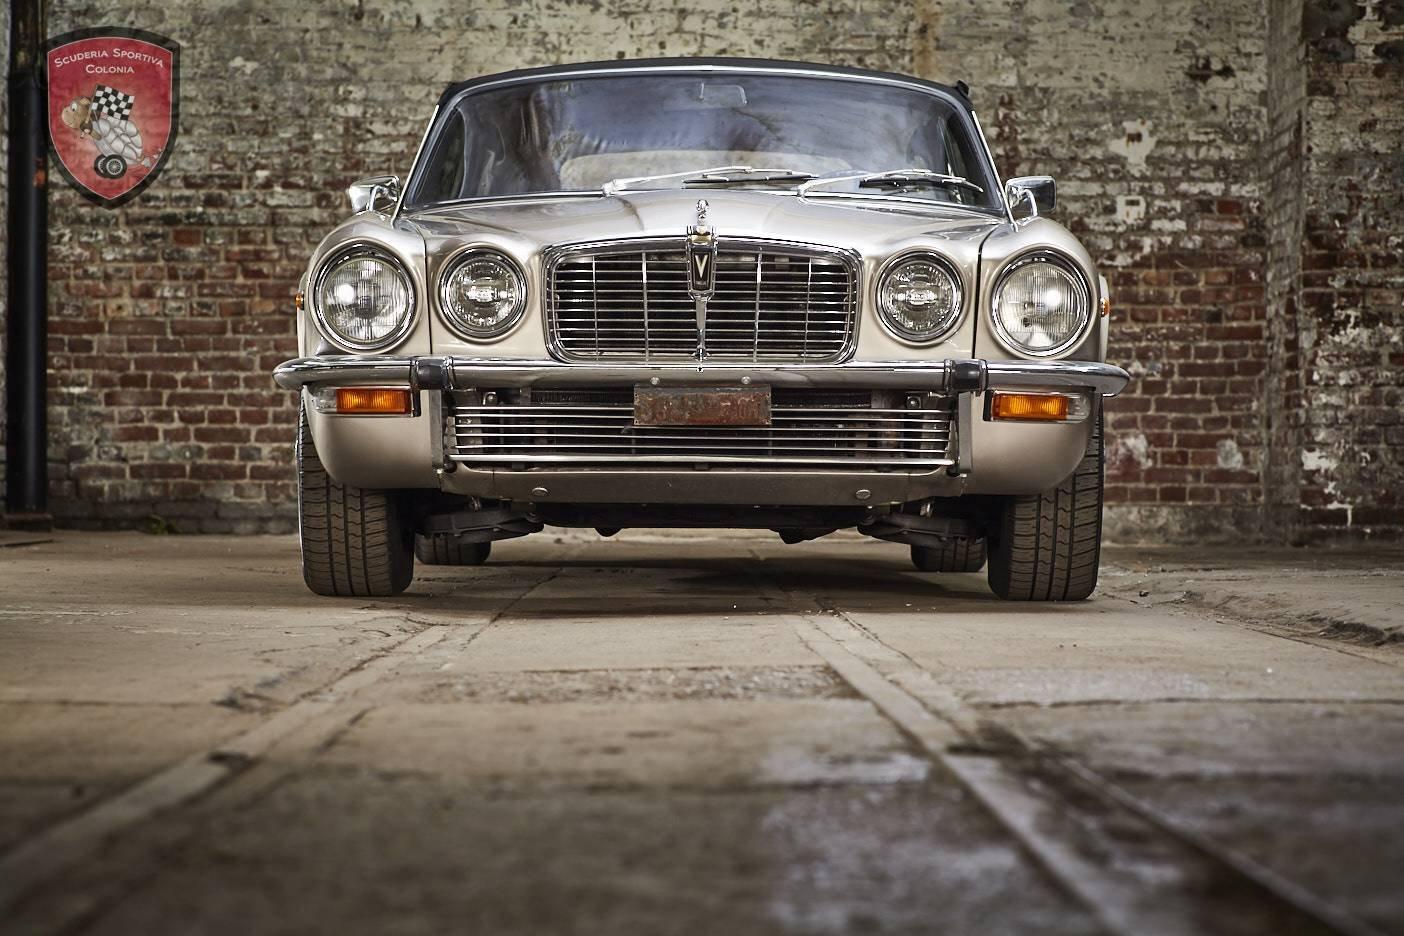 1974 Jaguar XJC 5.3 convertible For Sale (picture 1 of 6)